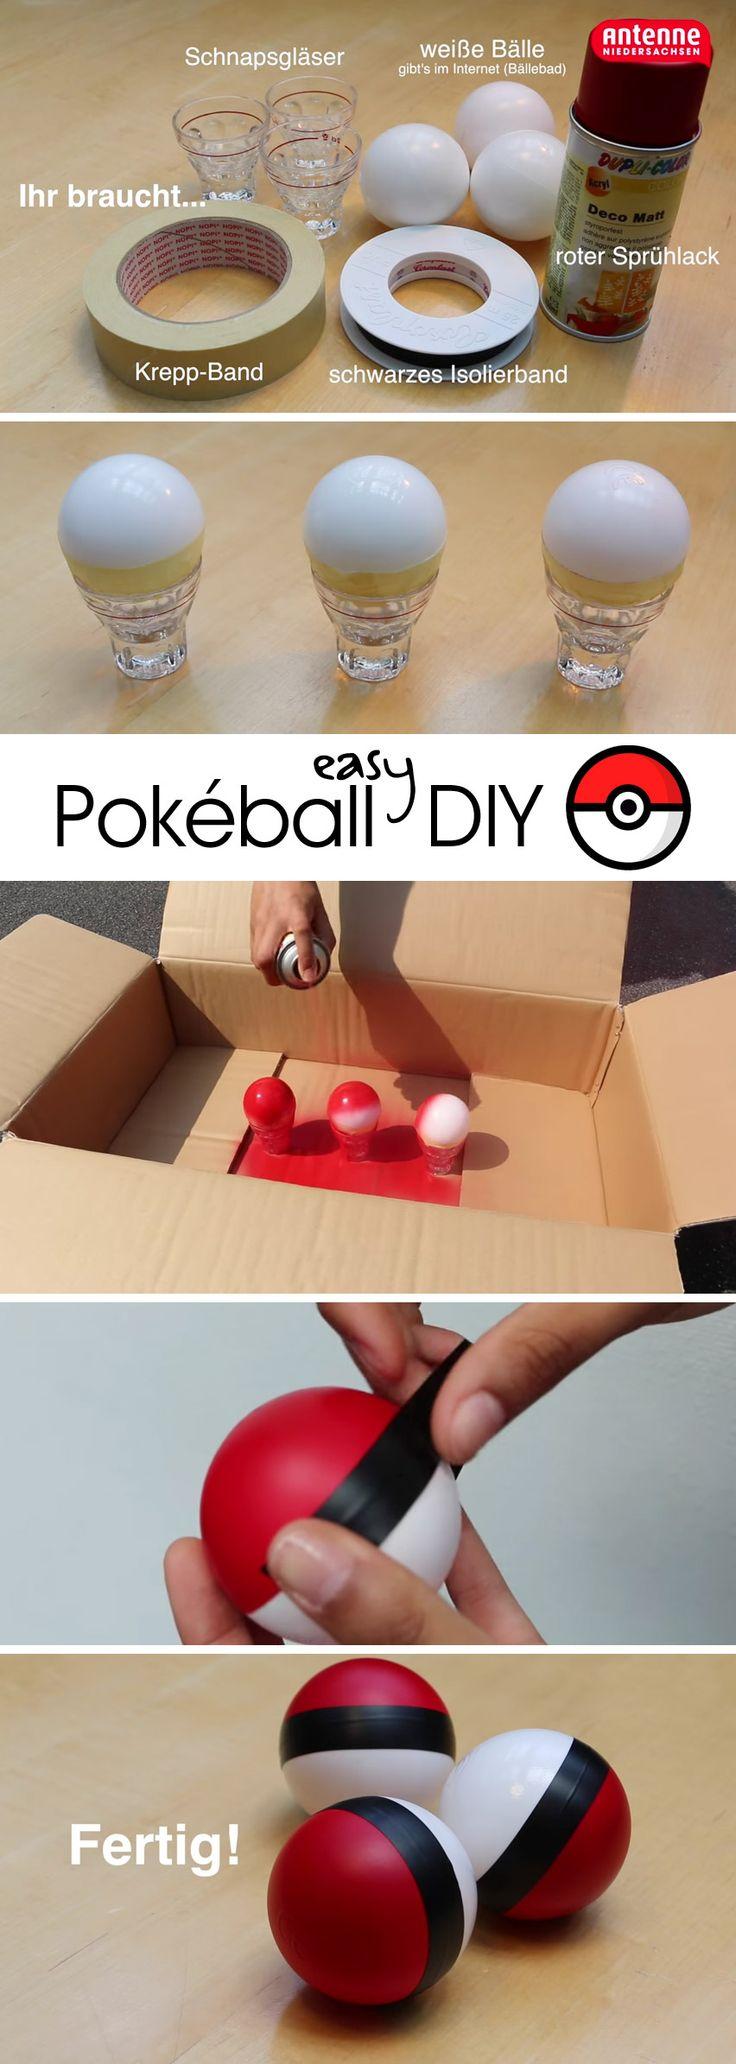 25 best Pokémon-Party | Kindergeburtstag images on Pinterest ...